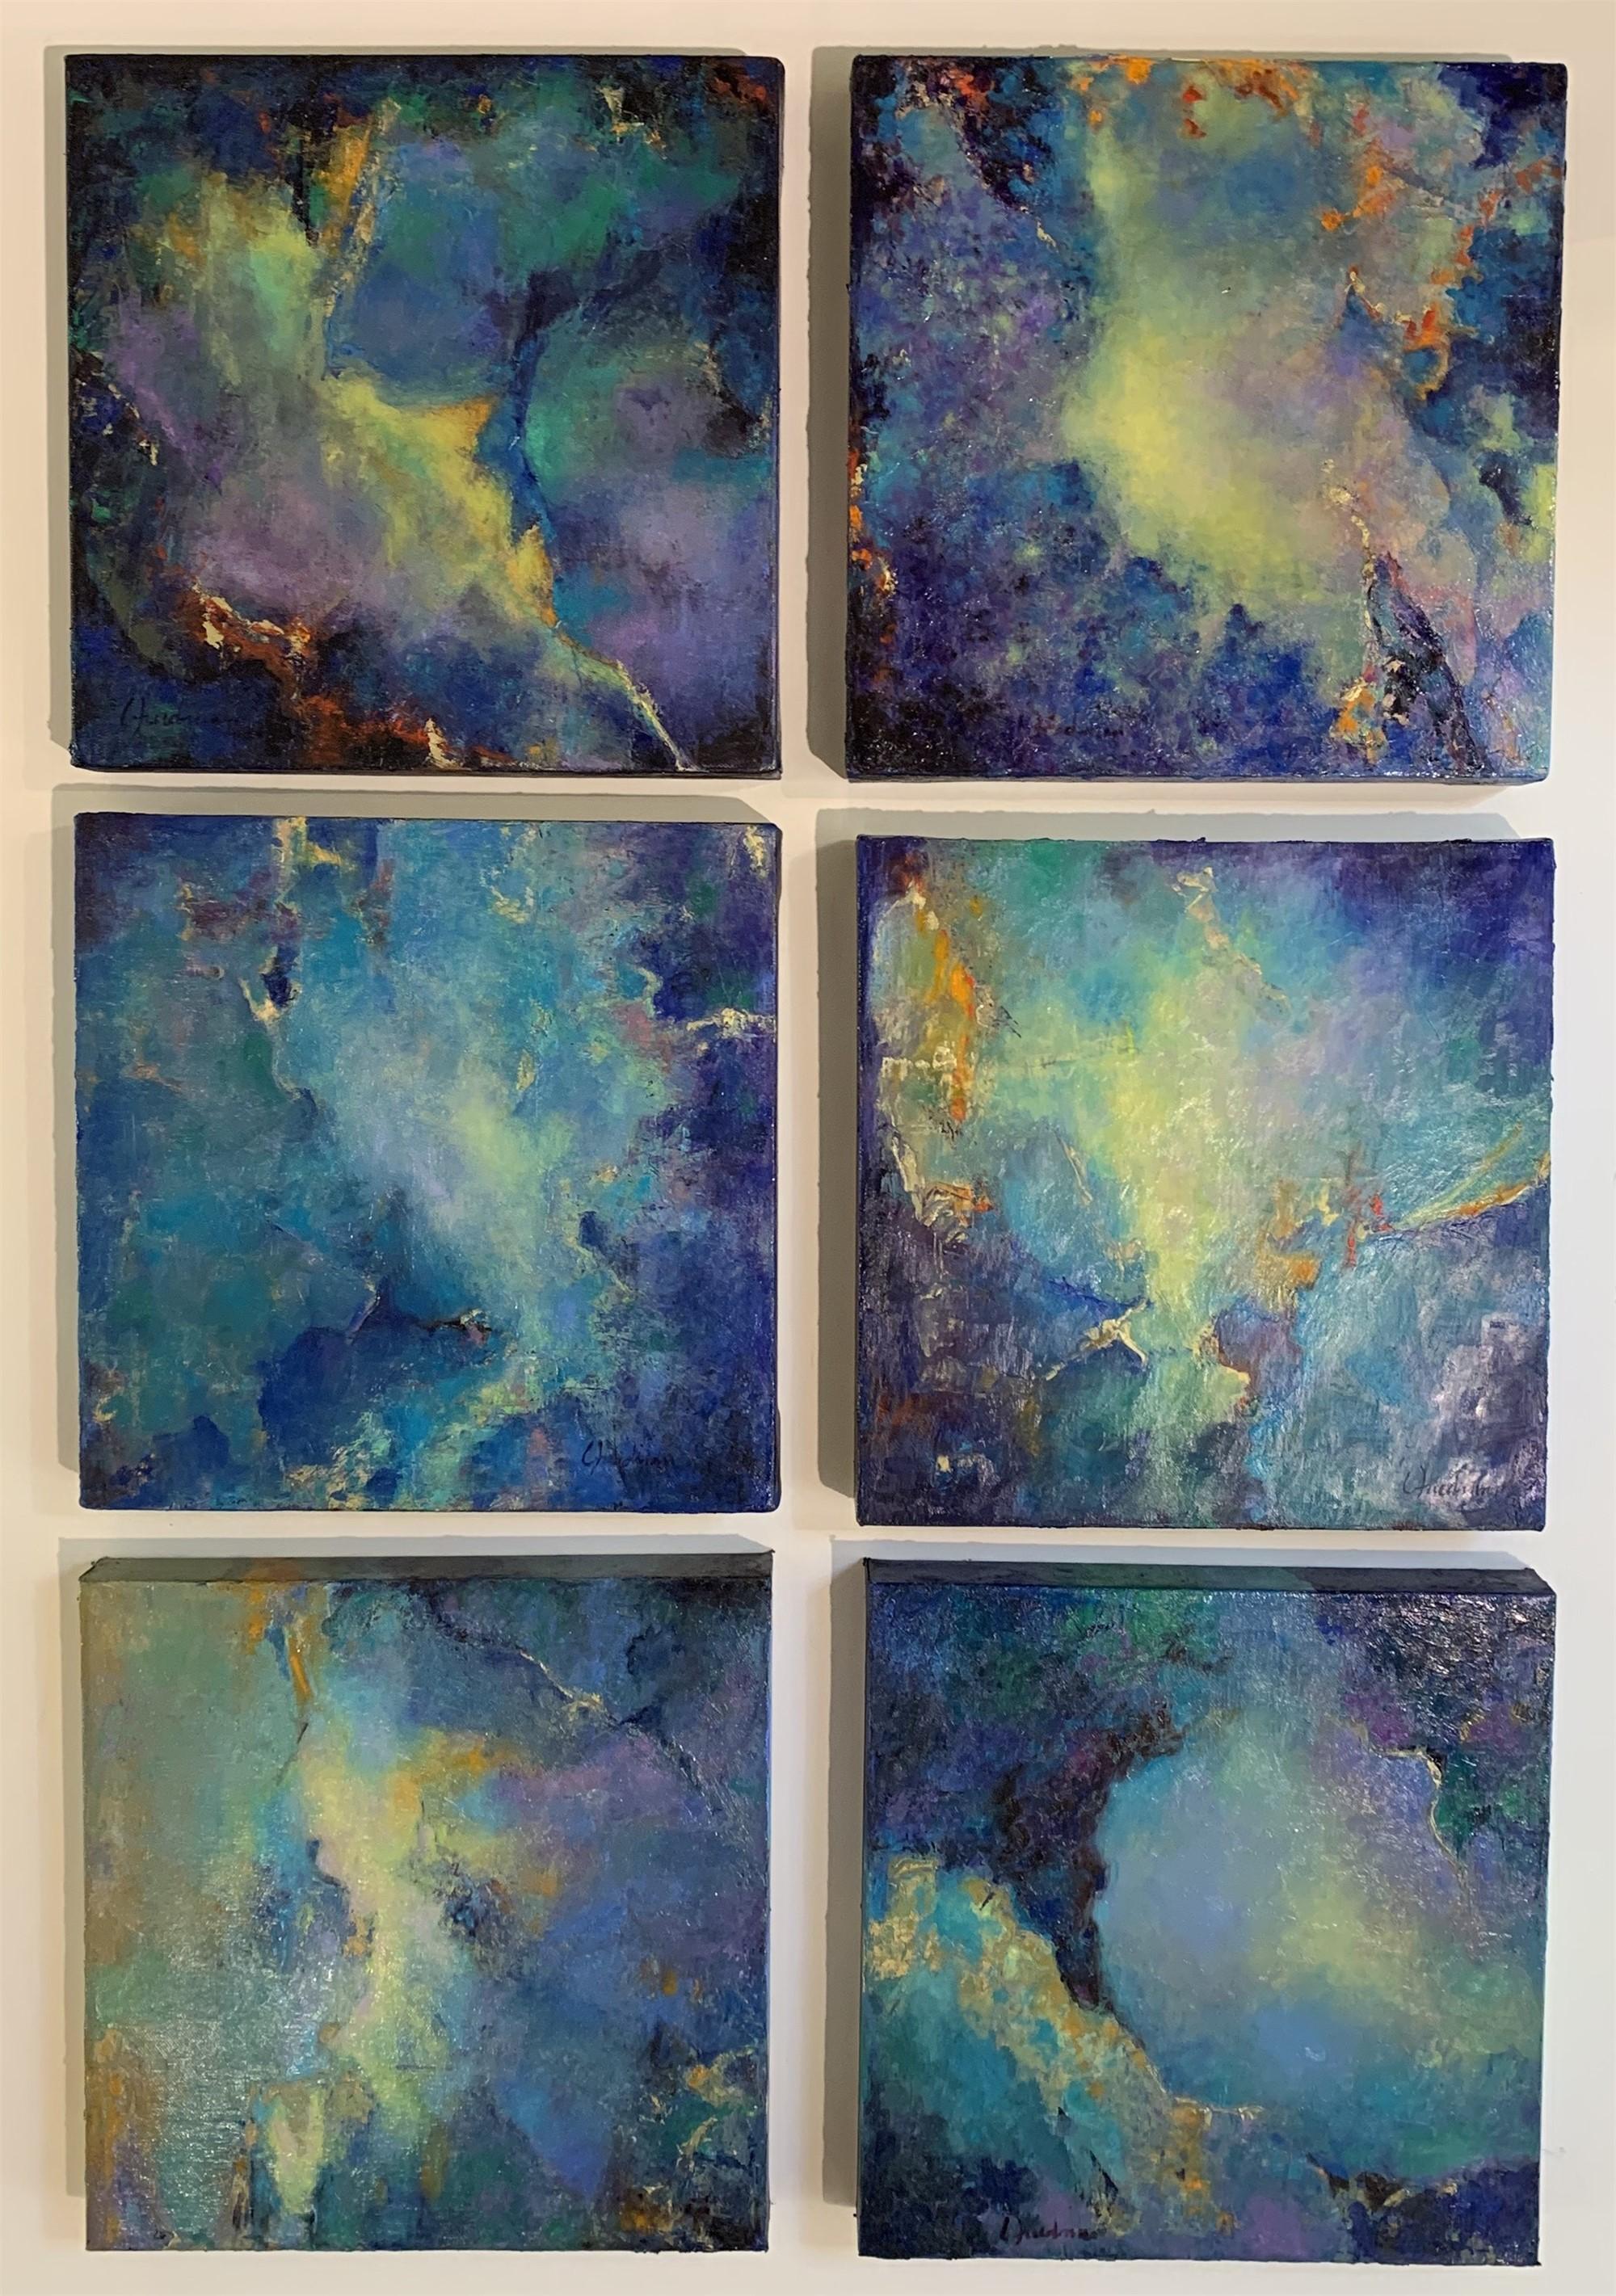 Numinous Series by Lissa Friedman